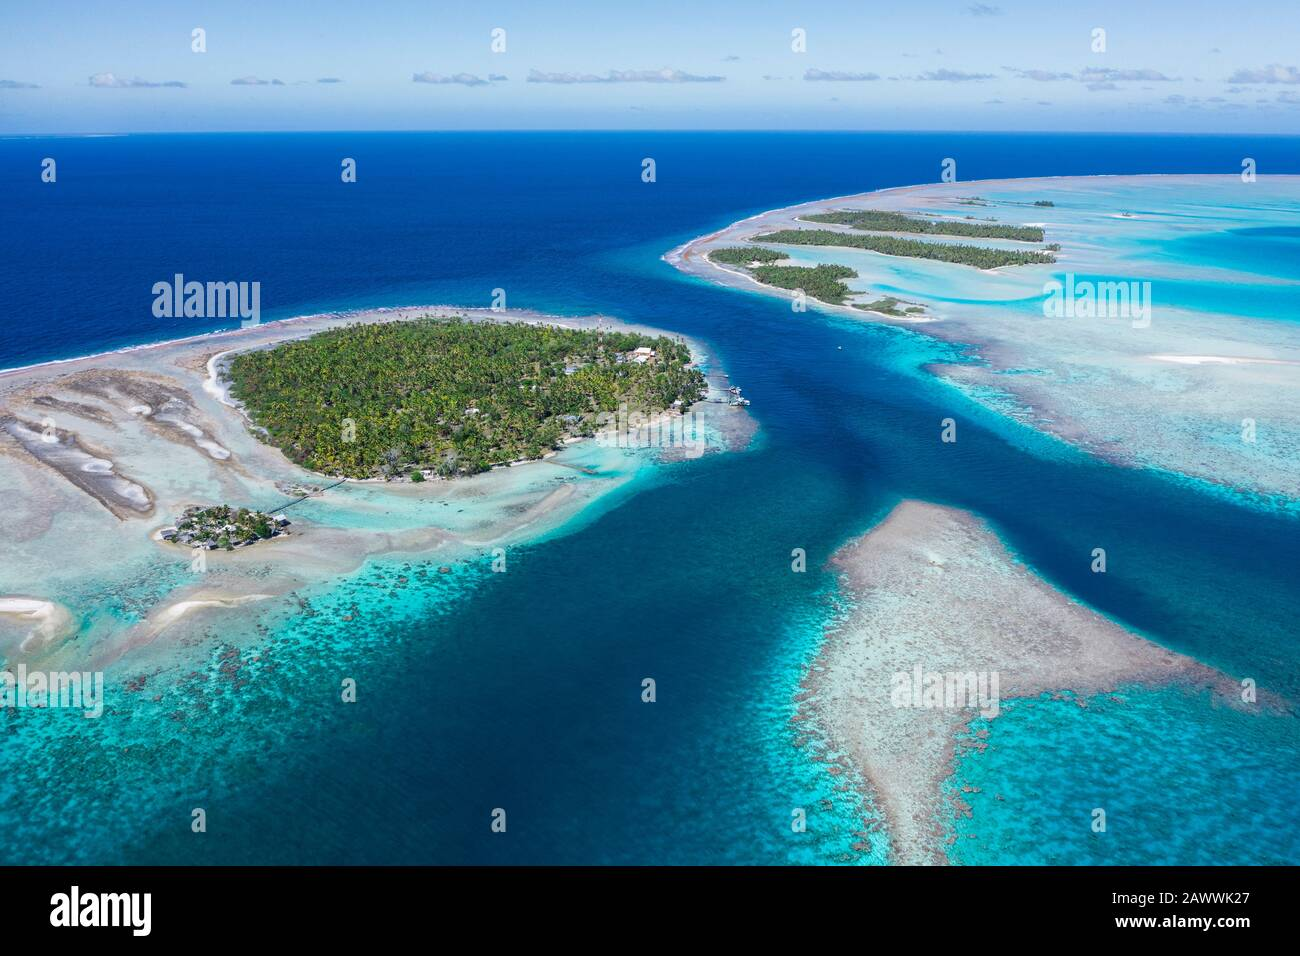 Puerto De Tetamanu Del Atolón De Fakarava, Tuamotu Archipel, Polinesia Francesa Foto de stock